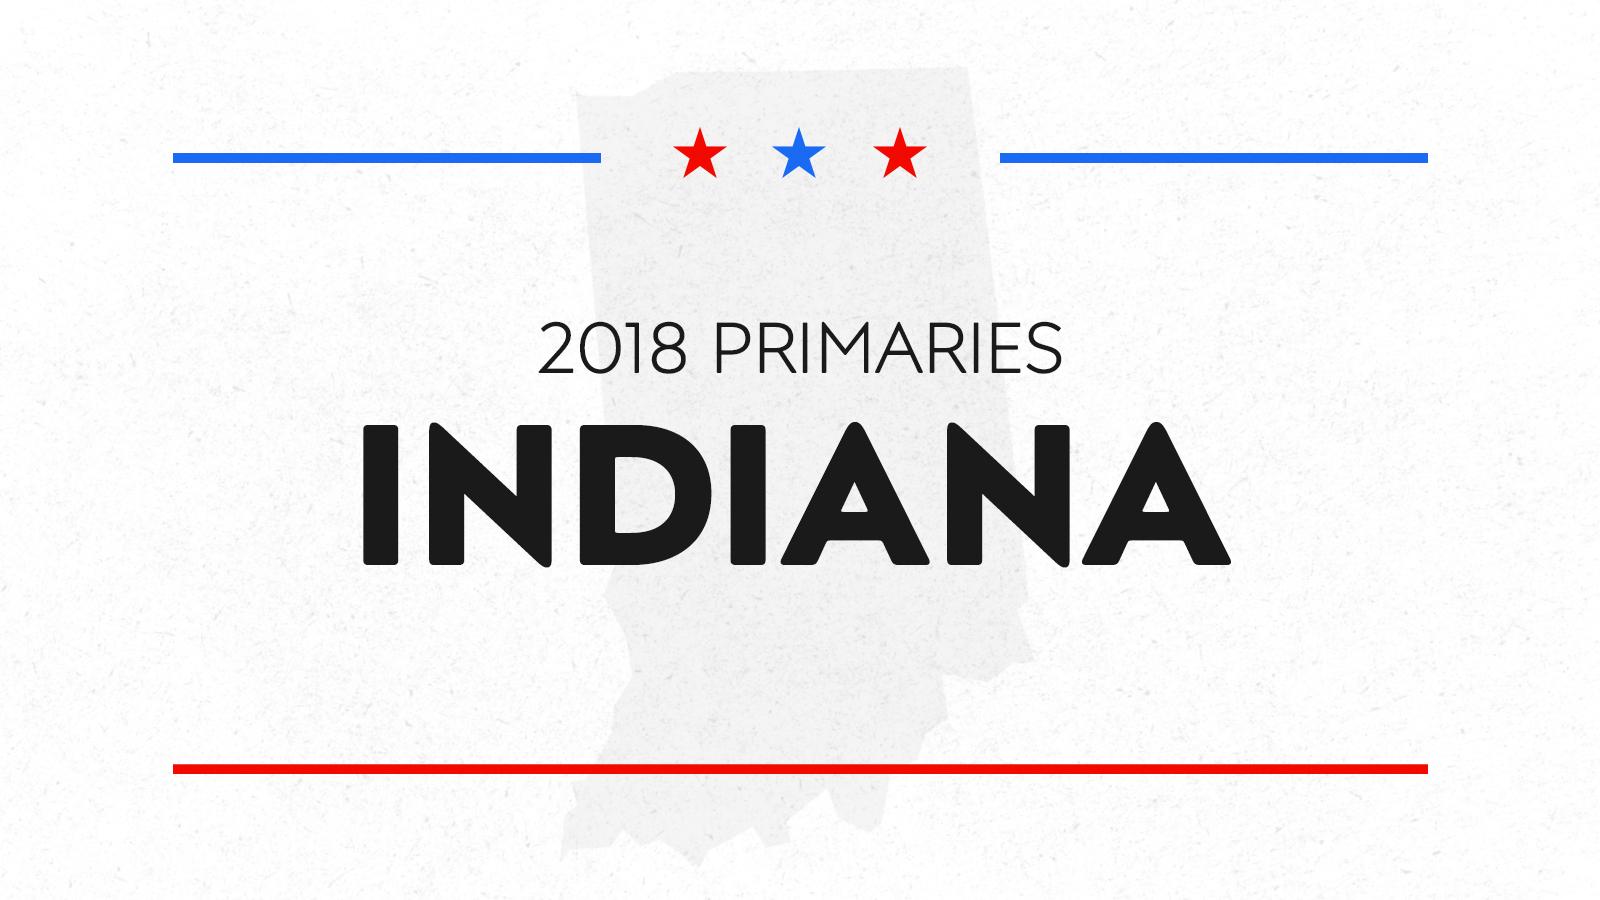 2018 Primary Election Results Missouri Judges 2010 General November 2nd